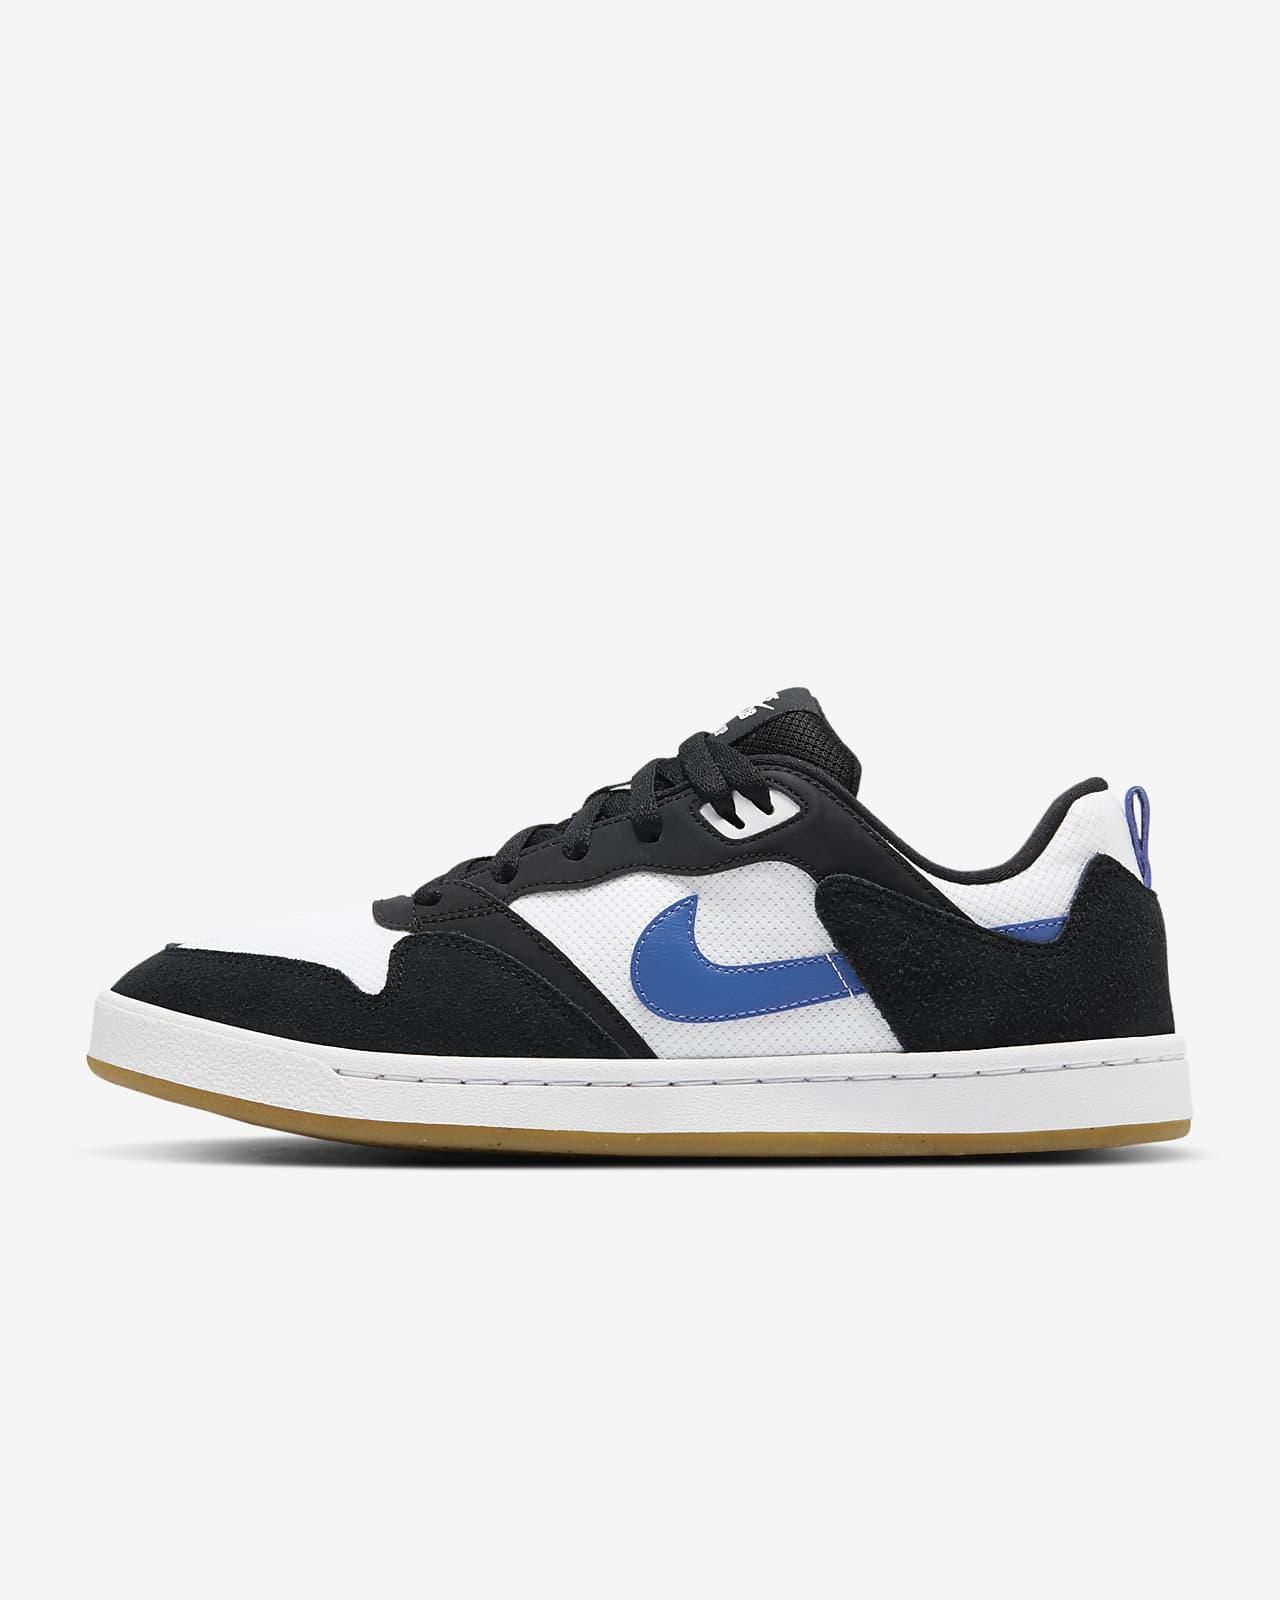 Nike SB Alleyoop 滑板鞋